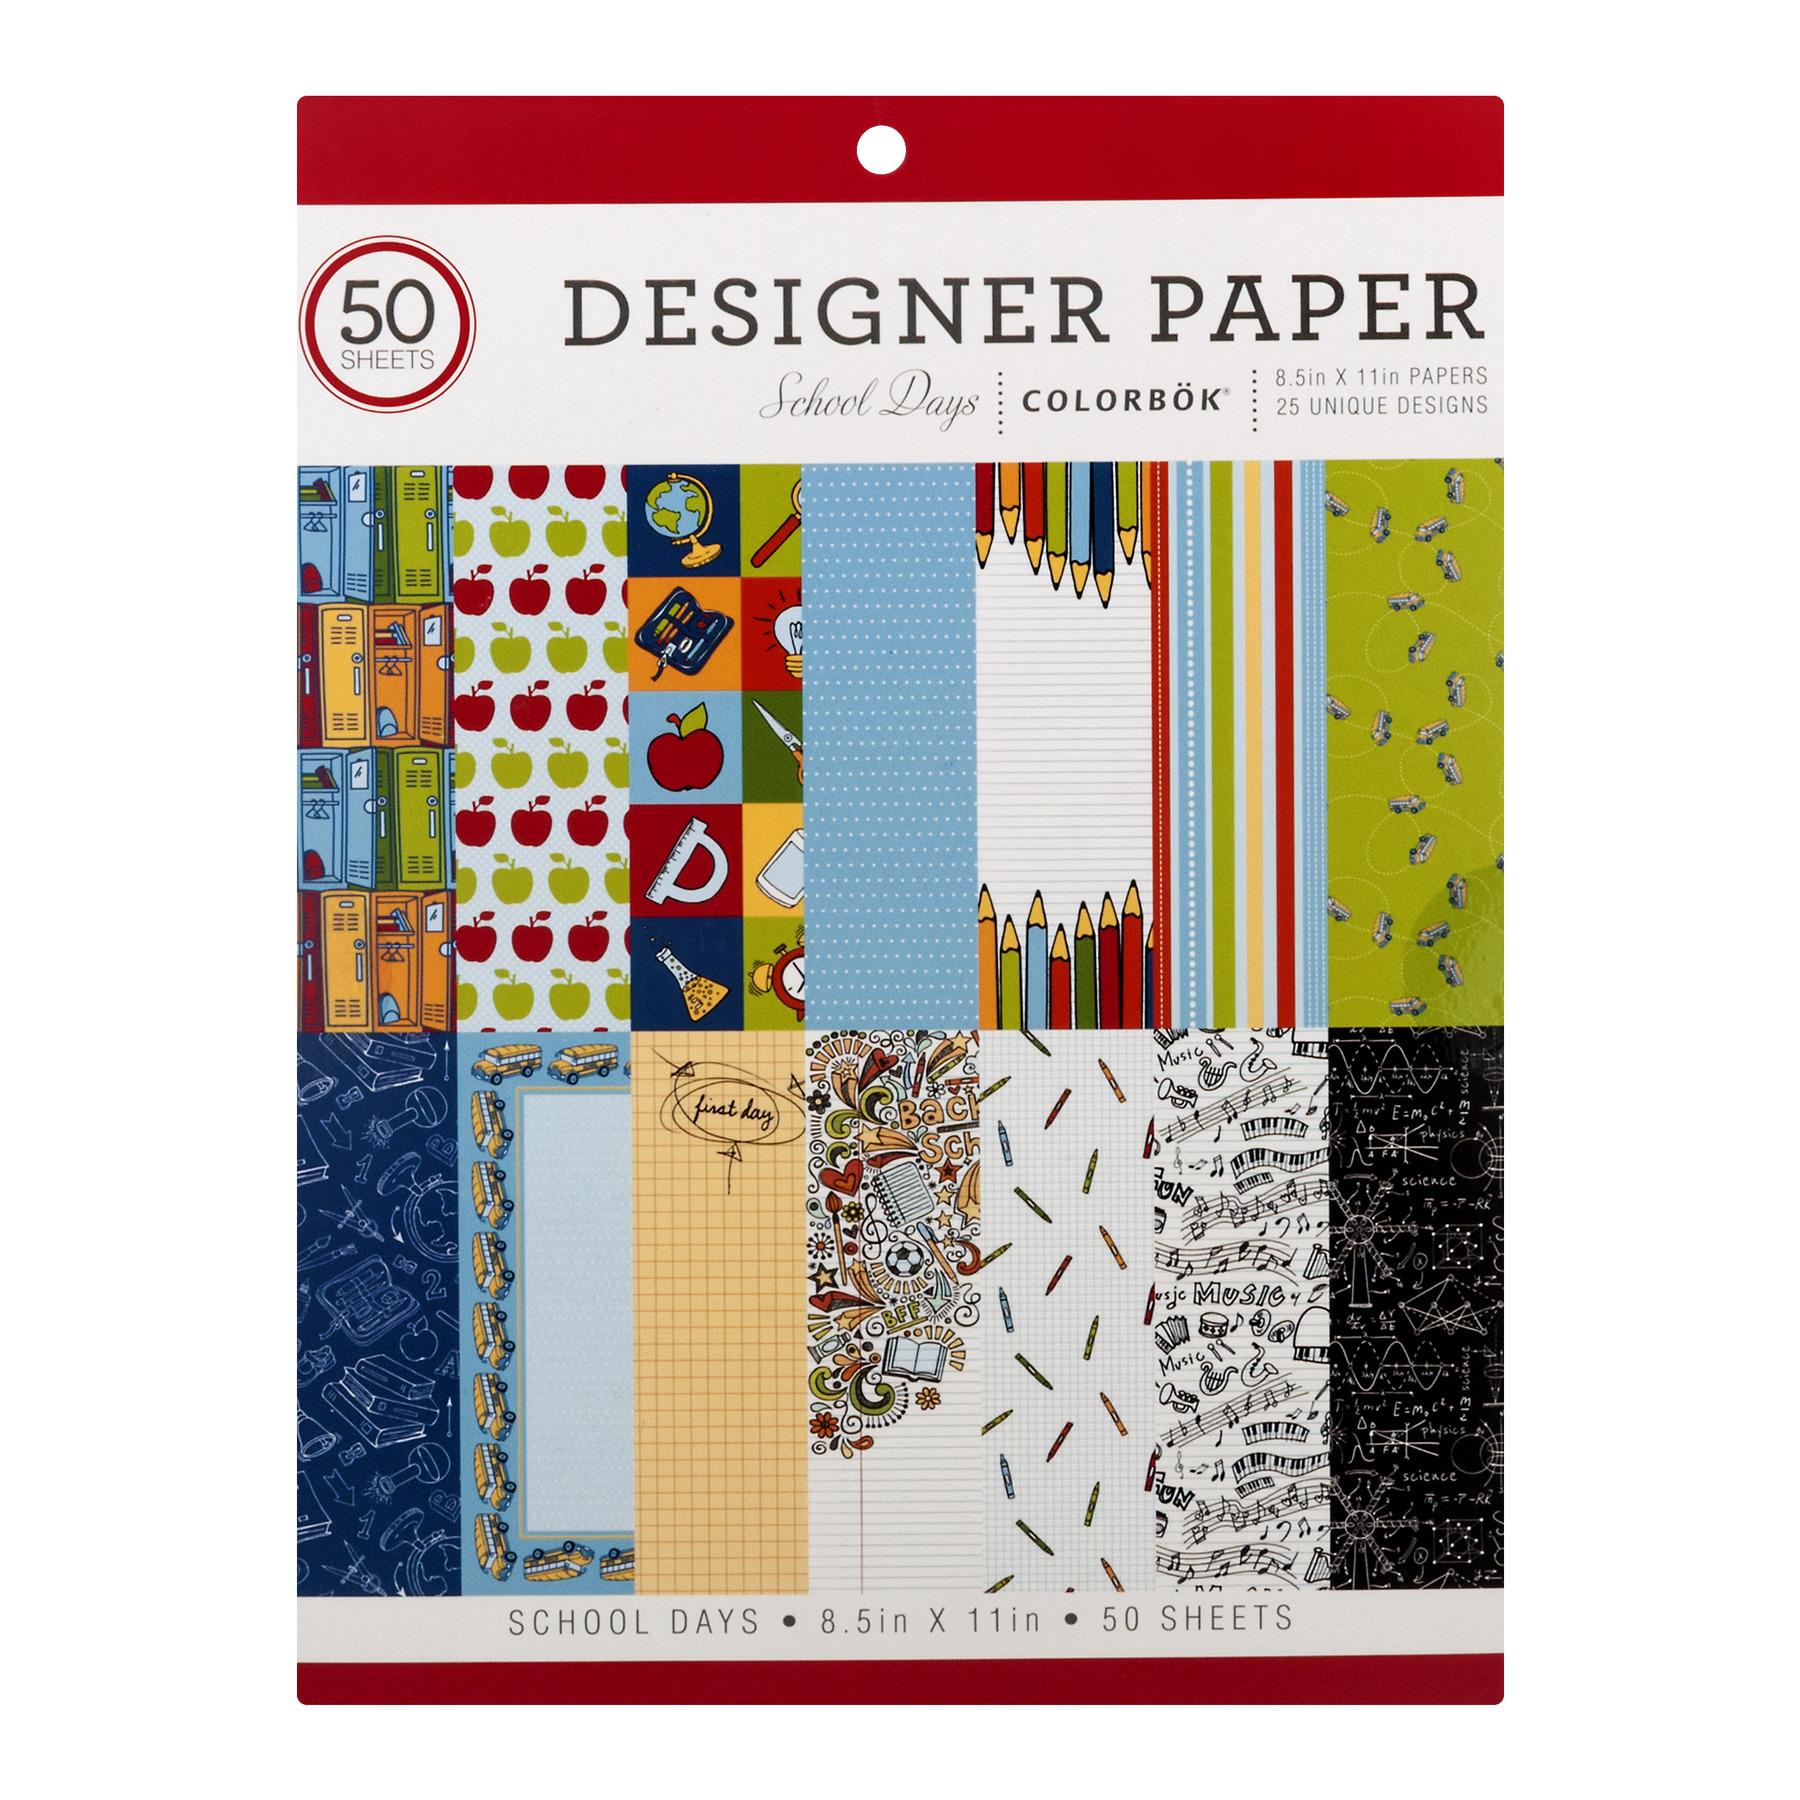 Colorbök School Days Designer Paper 8.5in X 11in, 150.0 CT